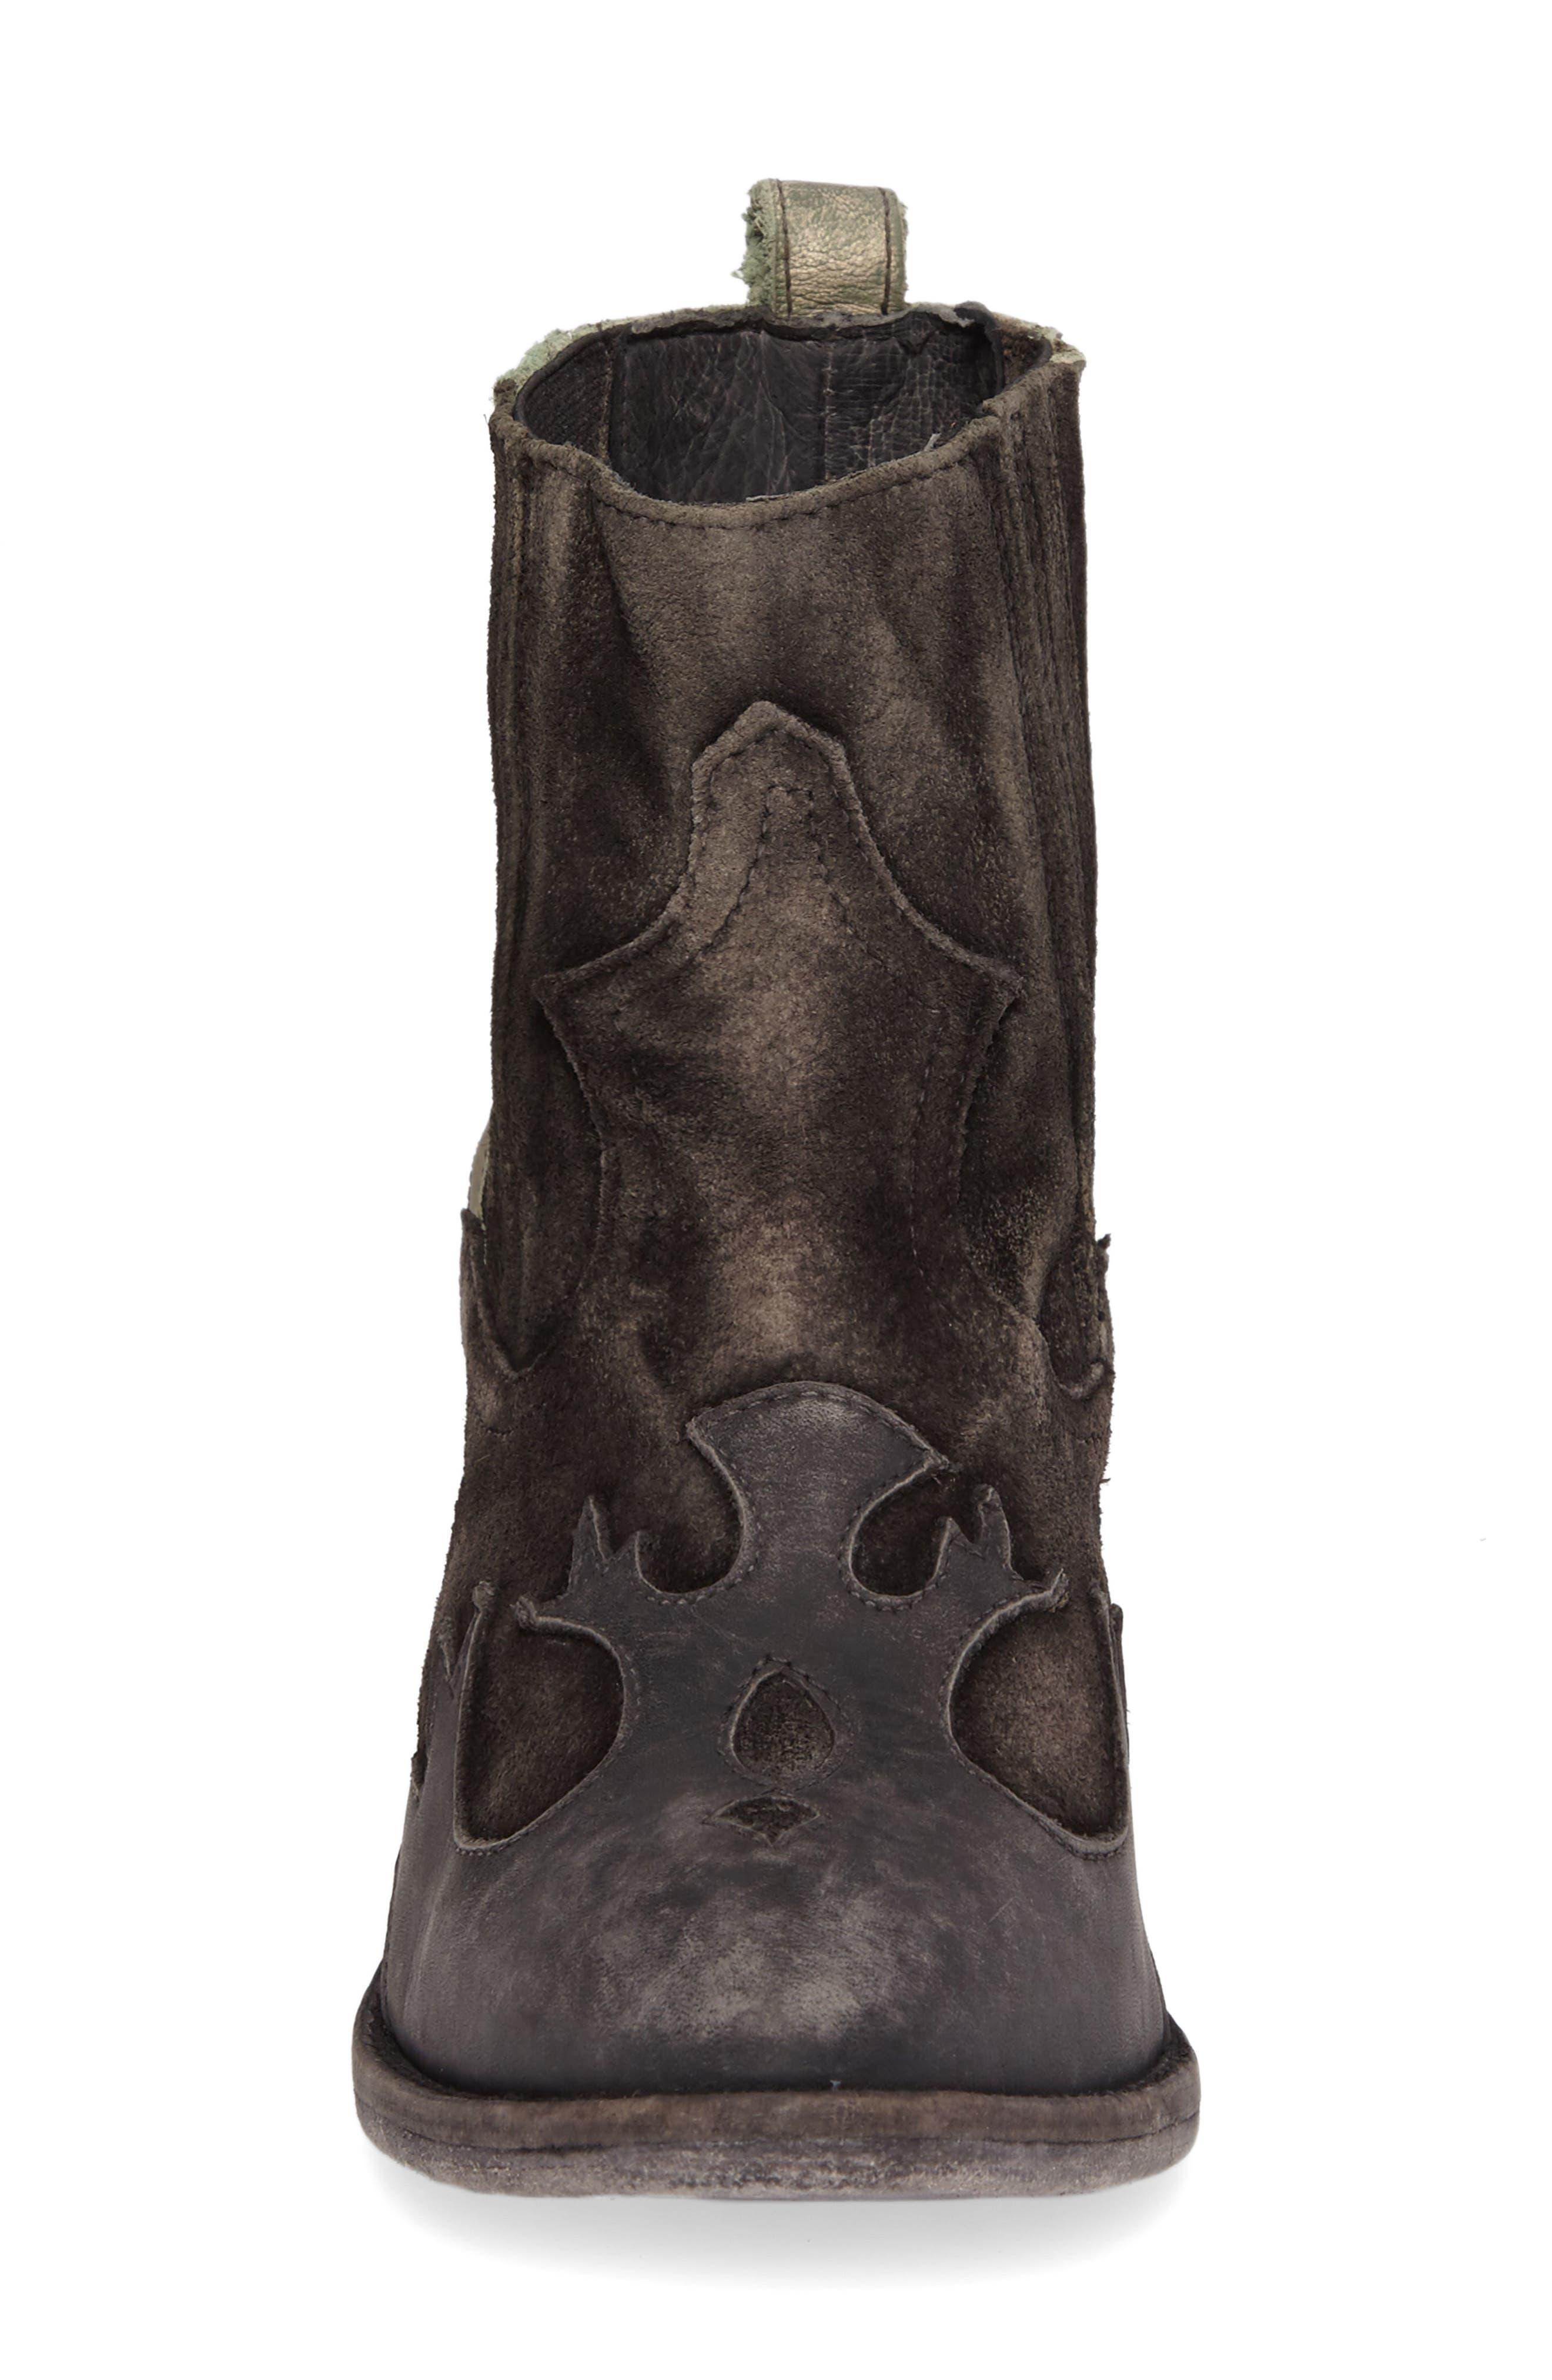 Royston Bootie,                             Alternate thumbnail 4, color,                             Black Leather